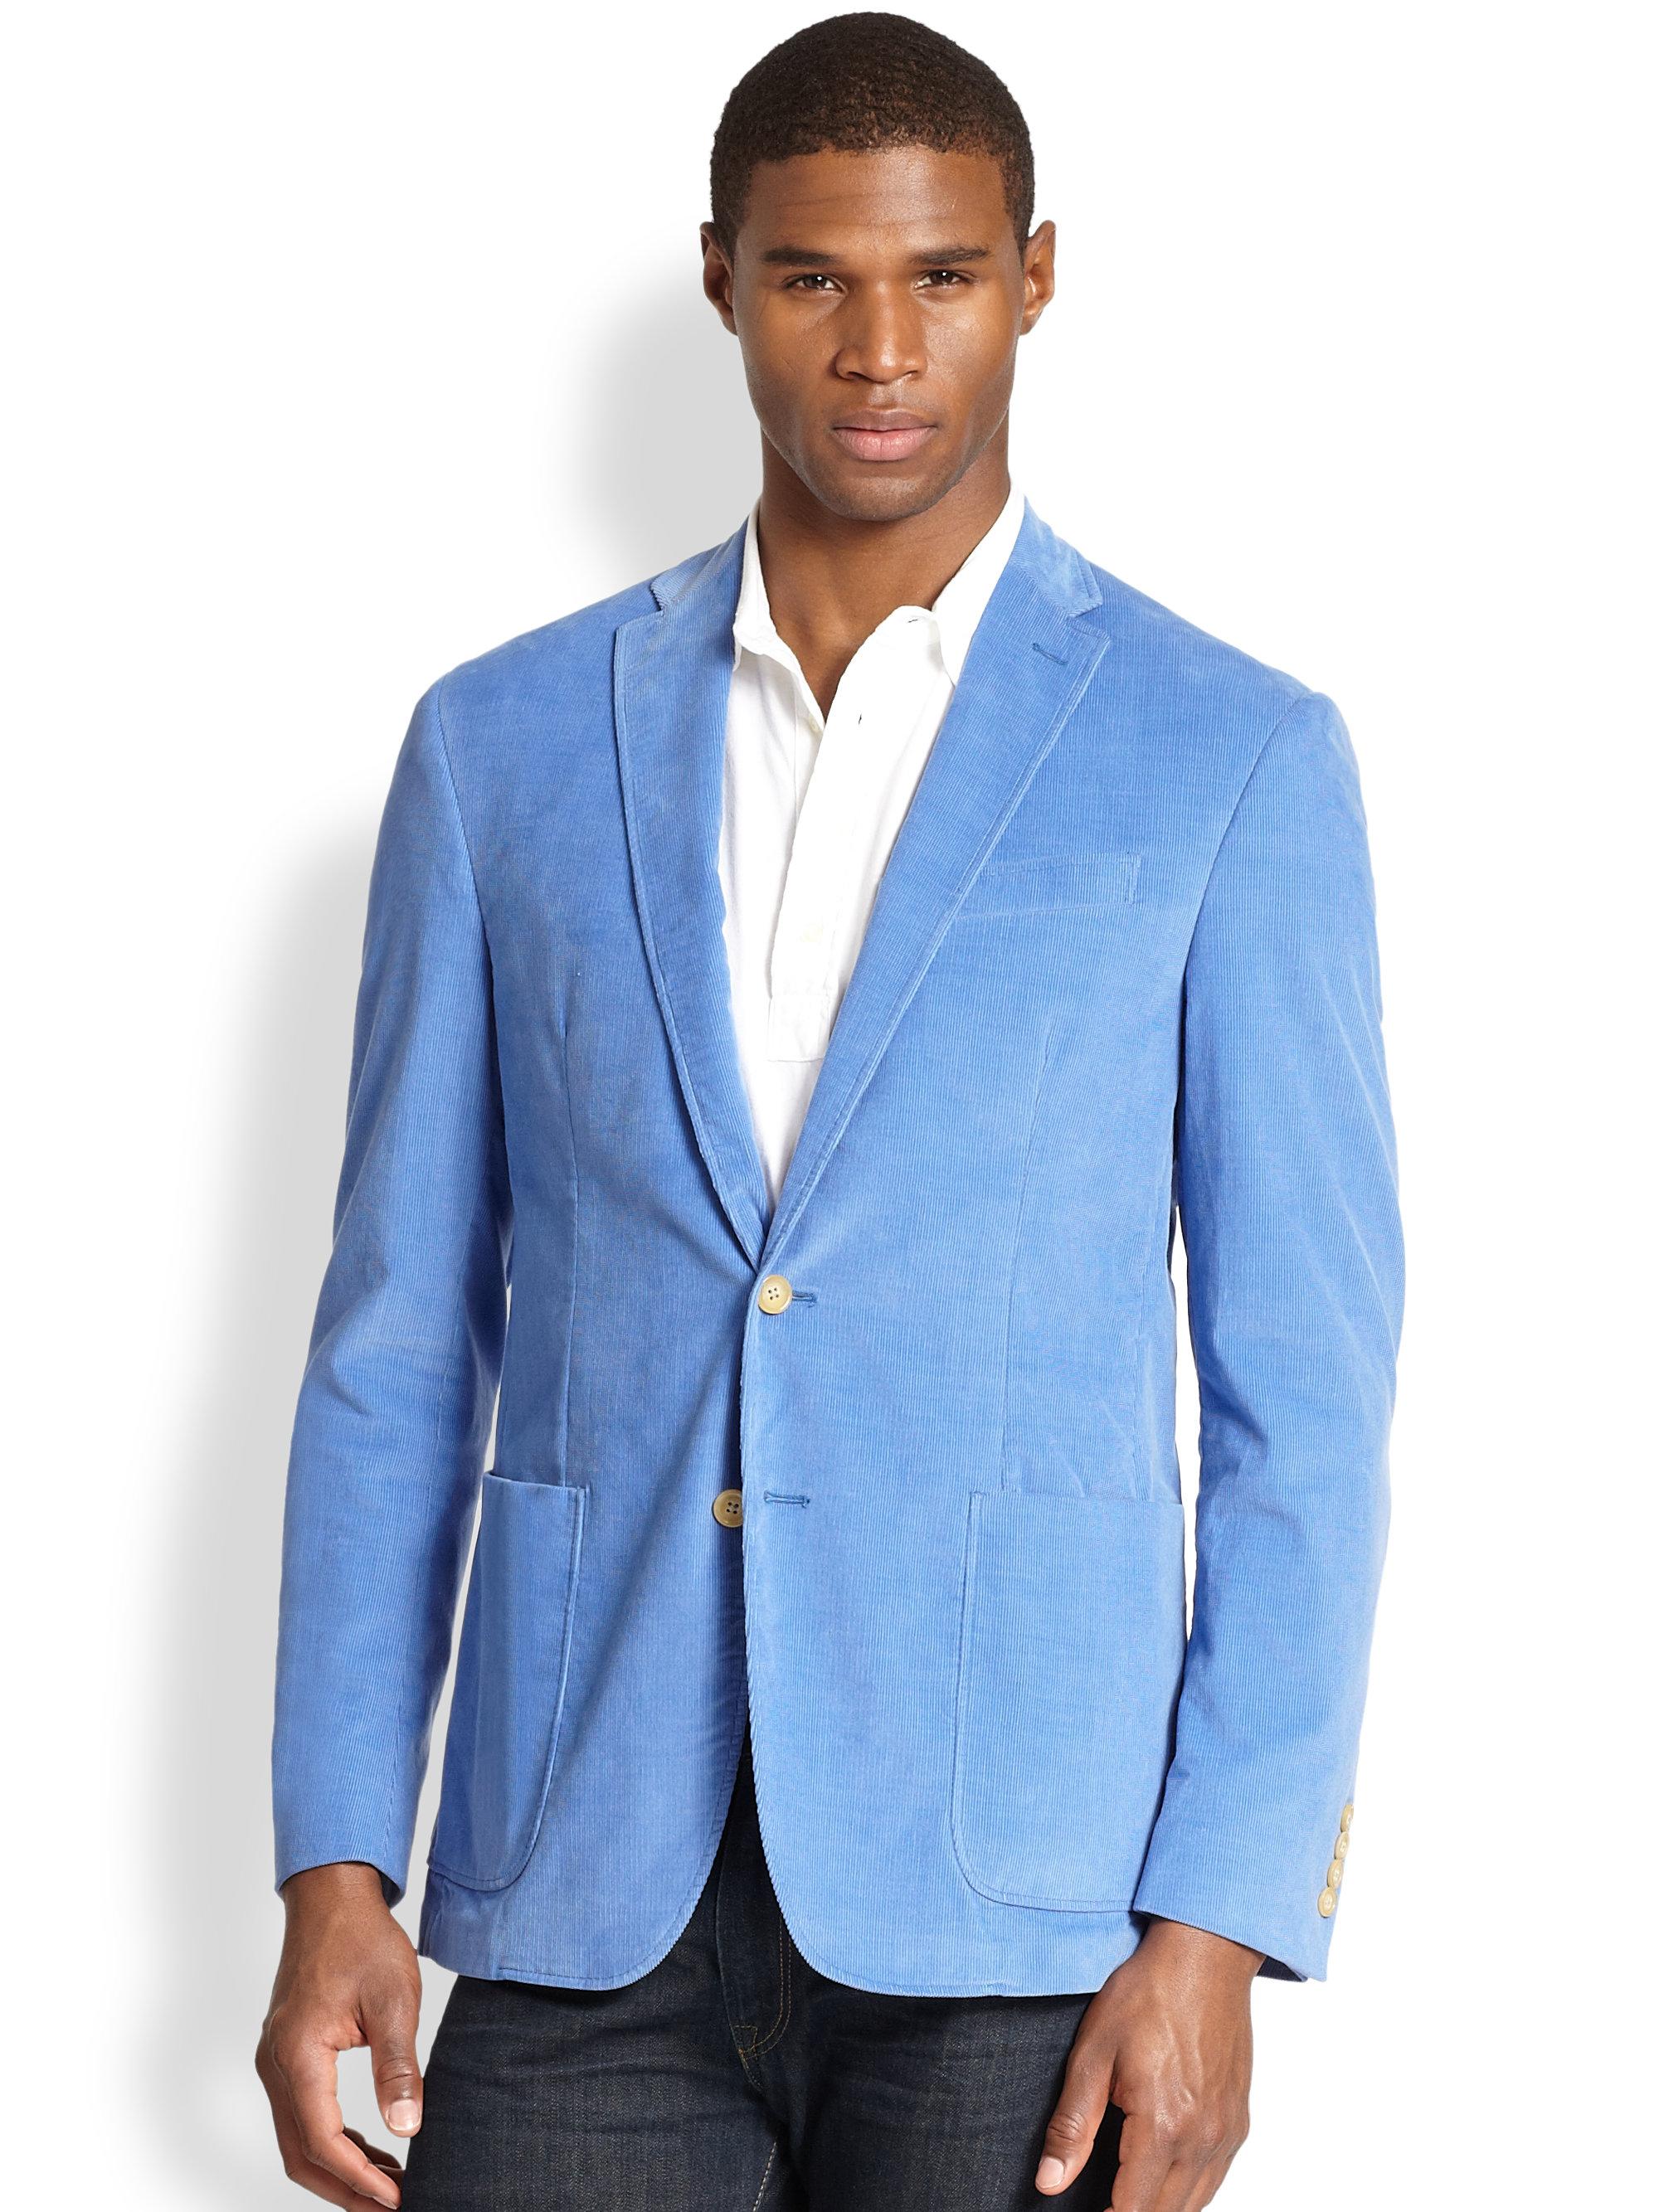 Ralph lauren men 39 s corduroy sport coat dr e horn gmbh for Polo shirt with sport coat